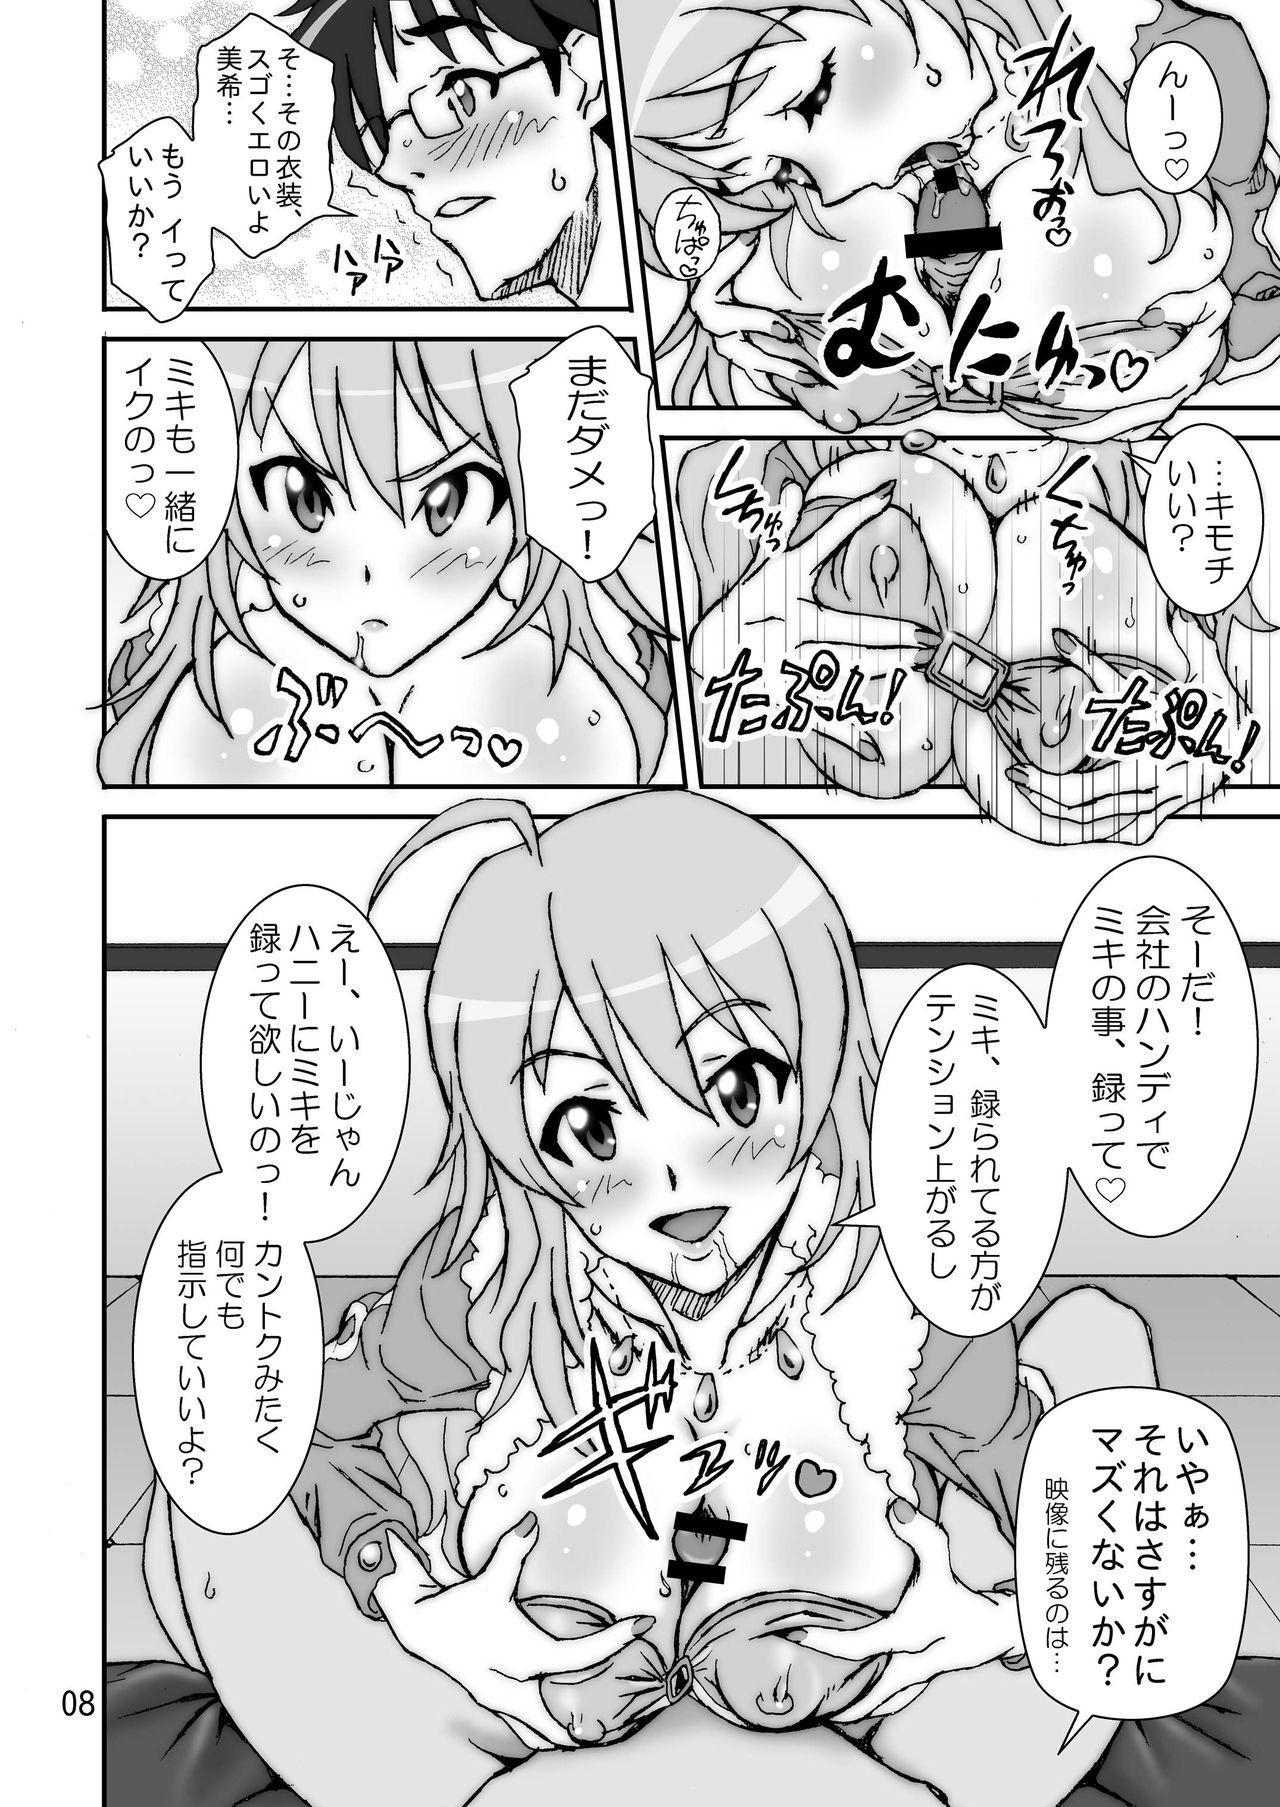 Fickle Twinkle Princess 7